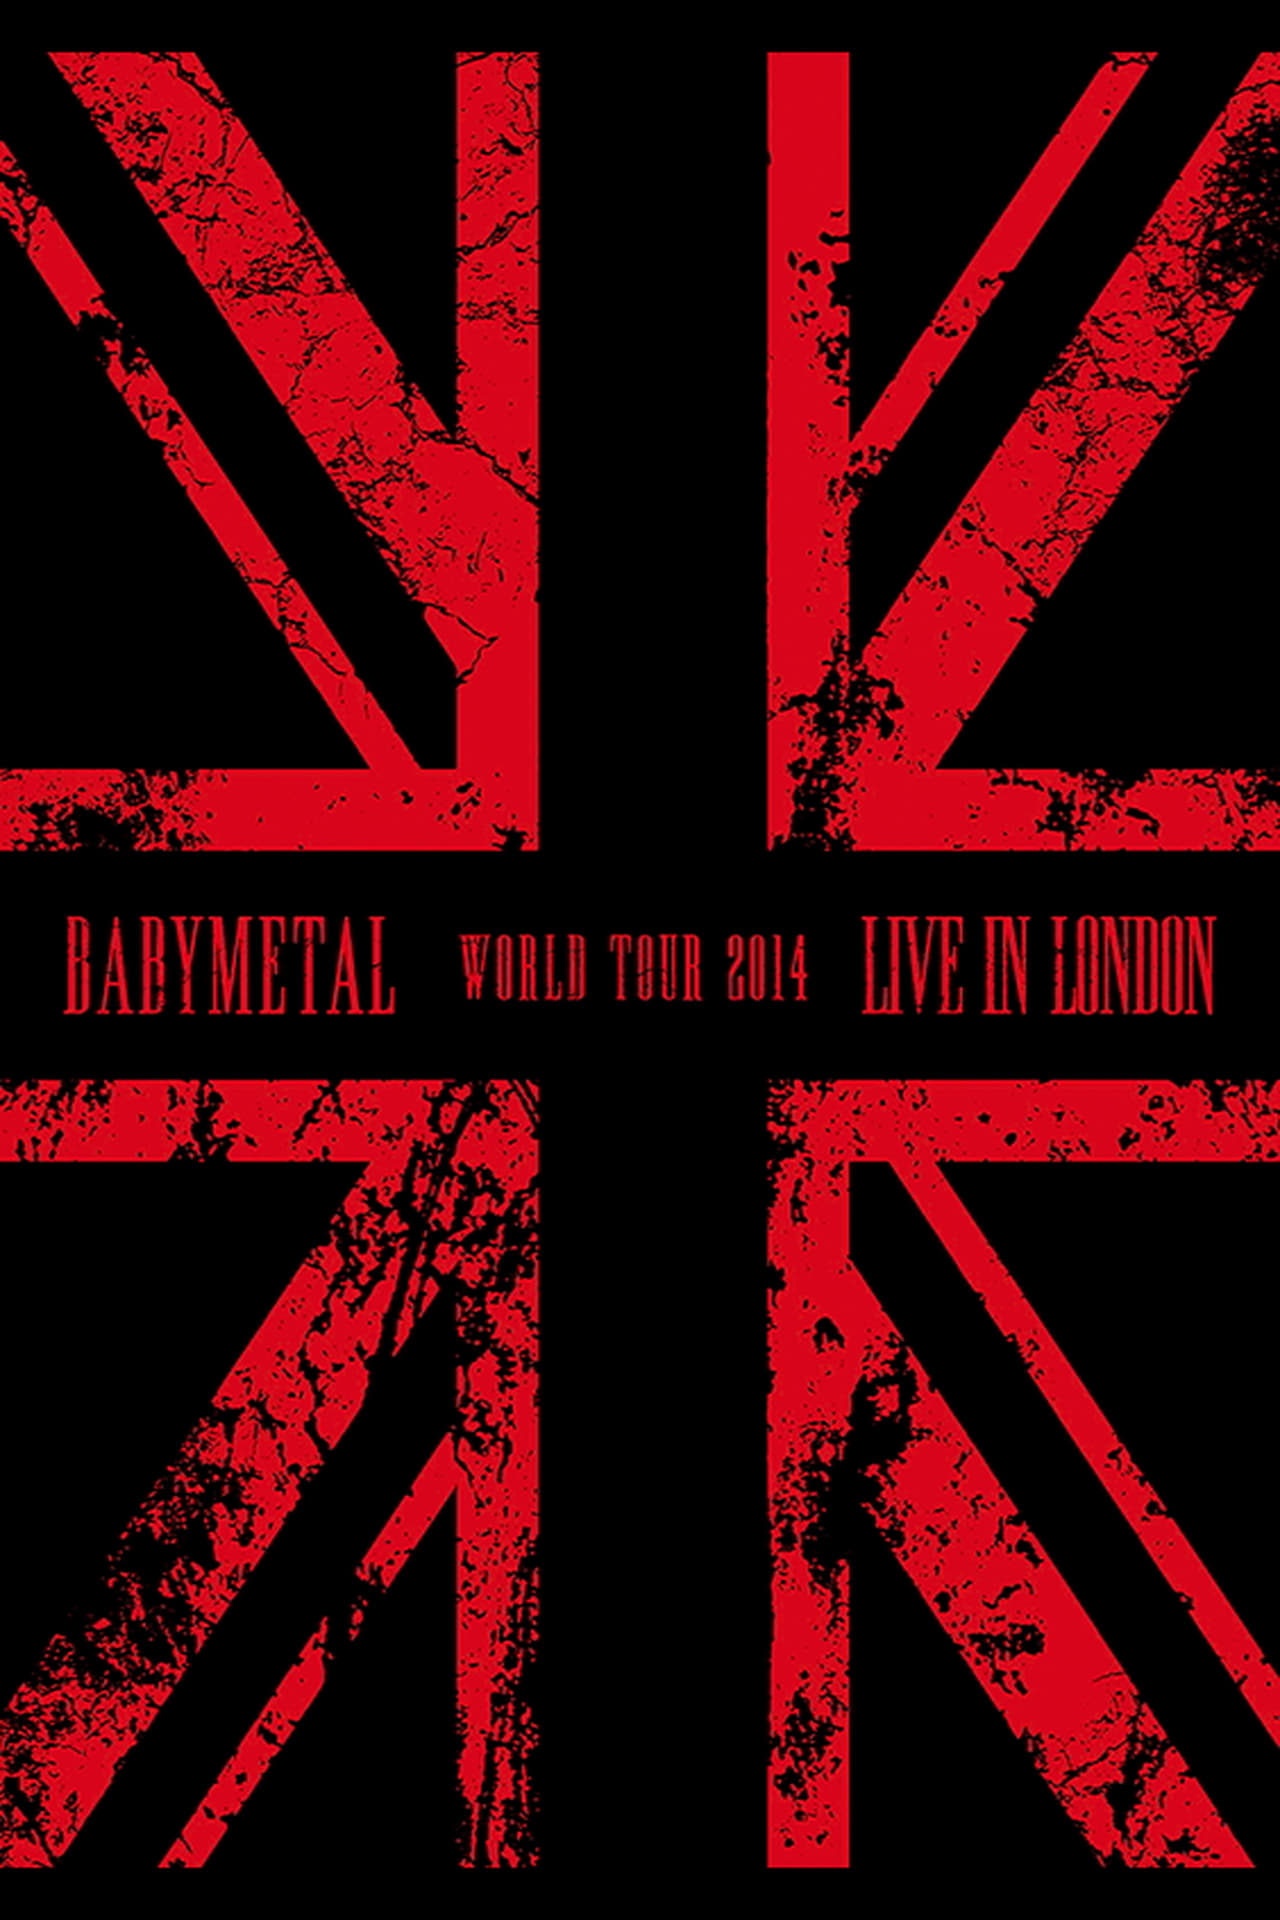 Babymetal - Live in London: World Tour 2014